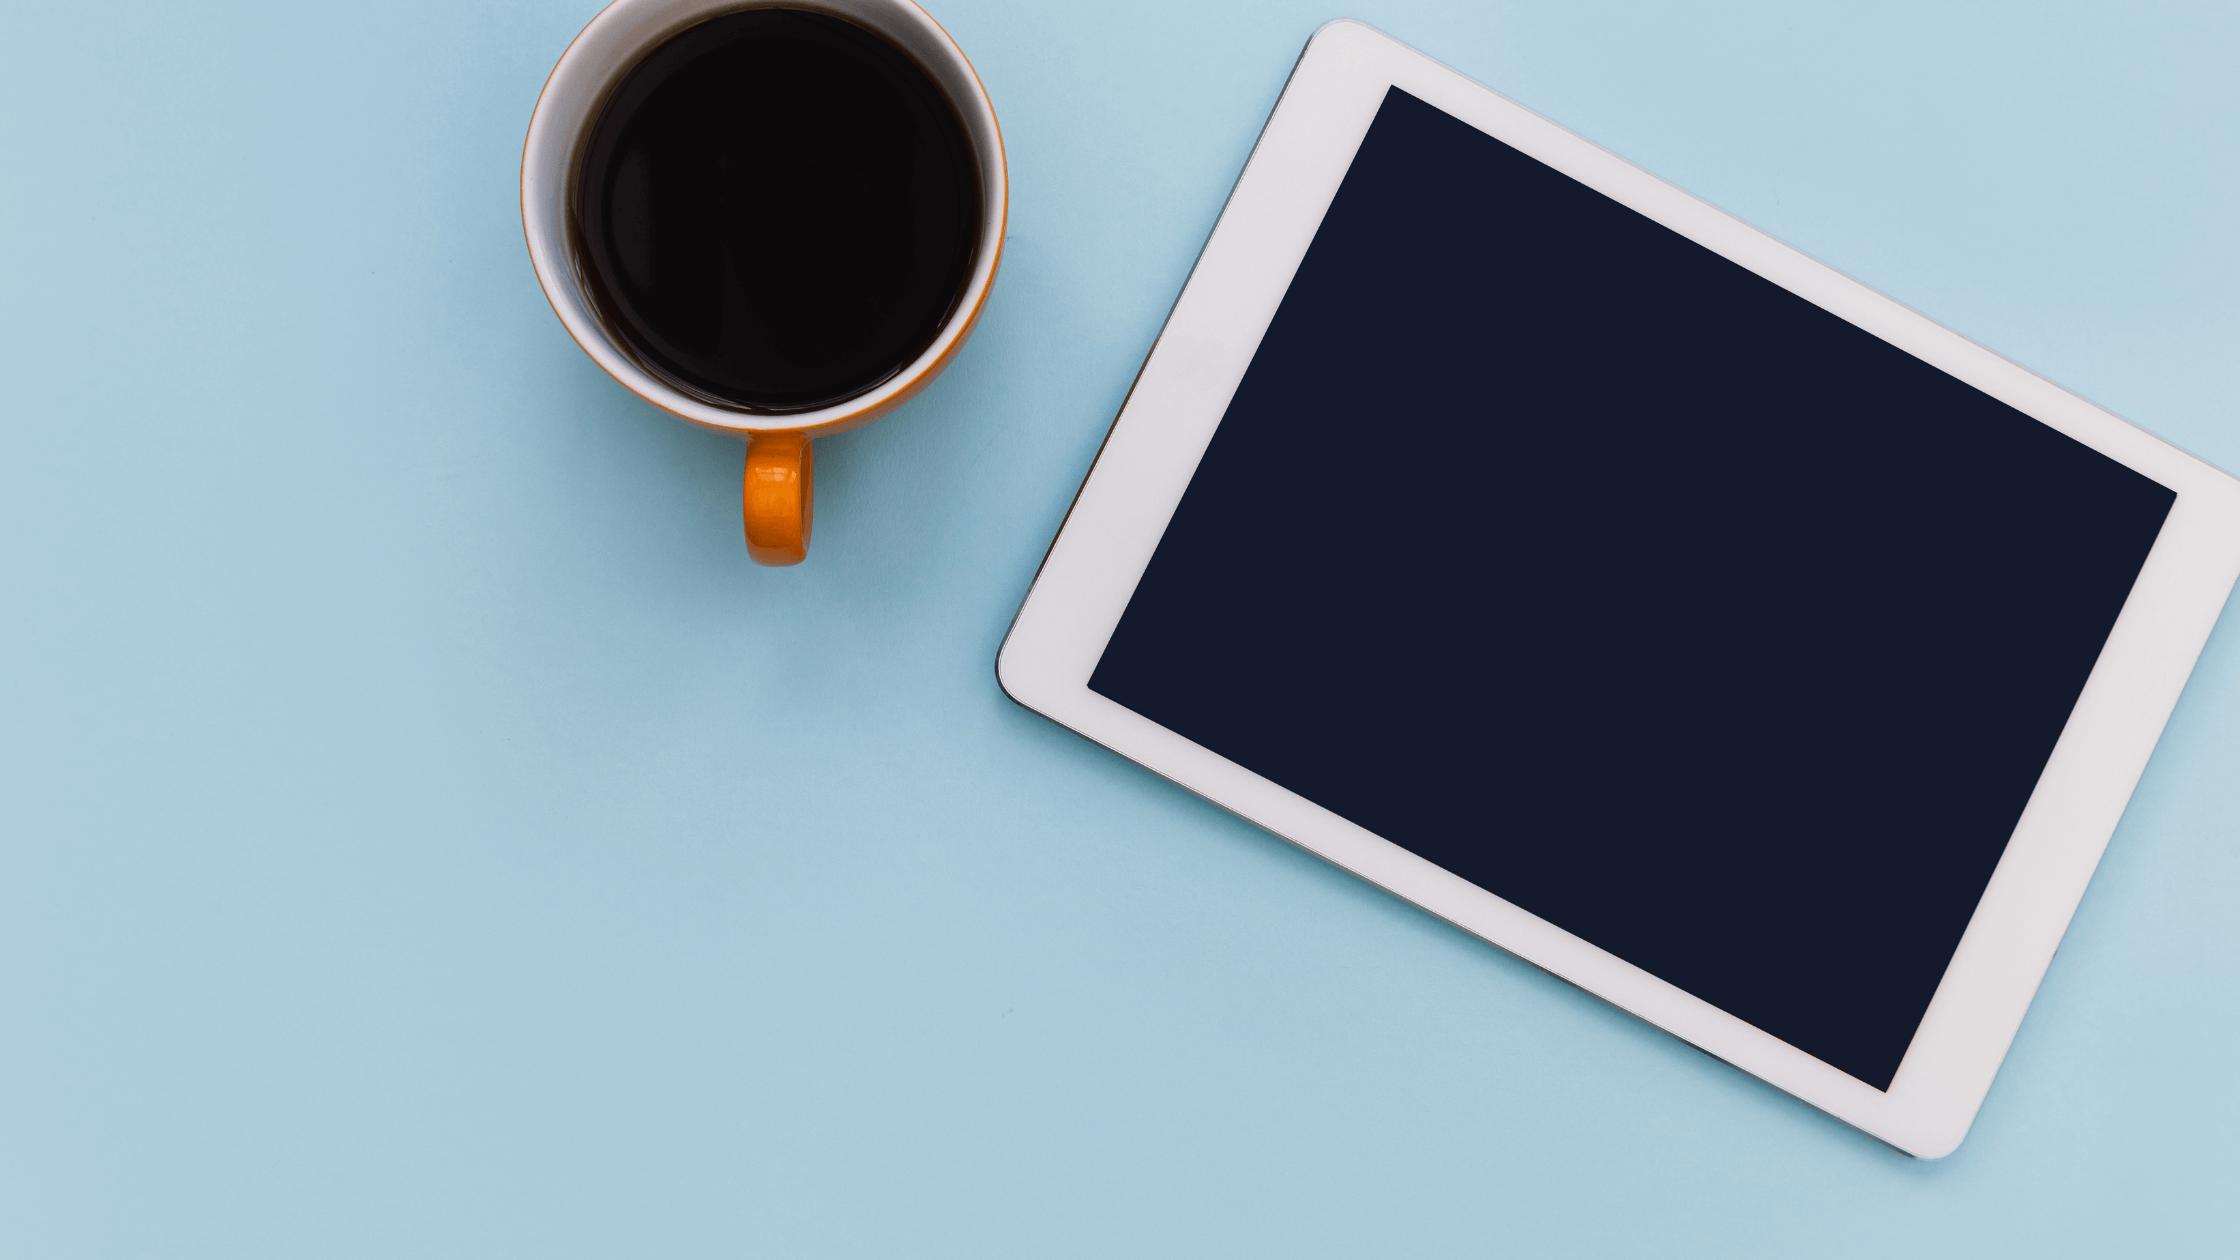 iPad Screen and coffee mug